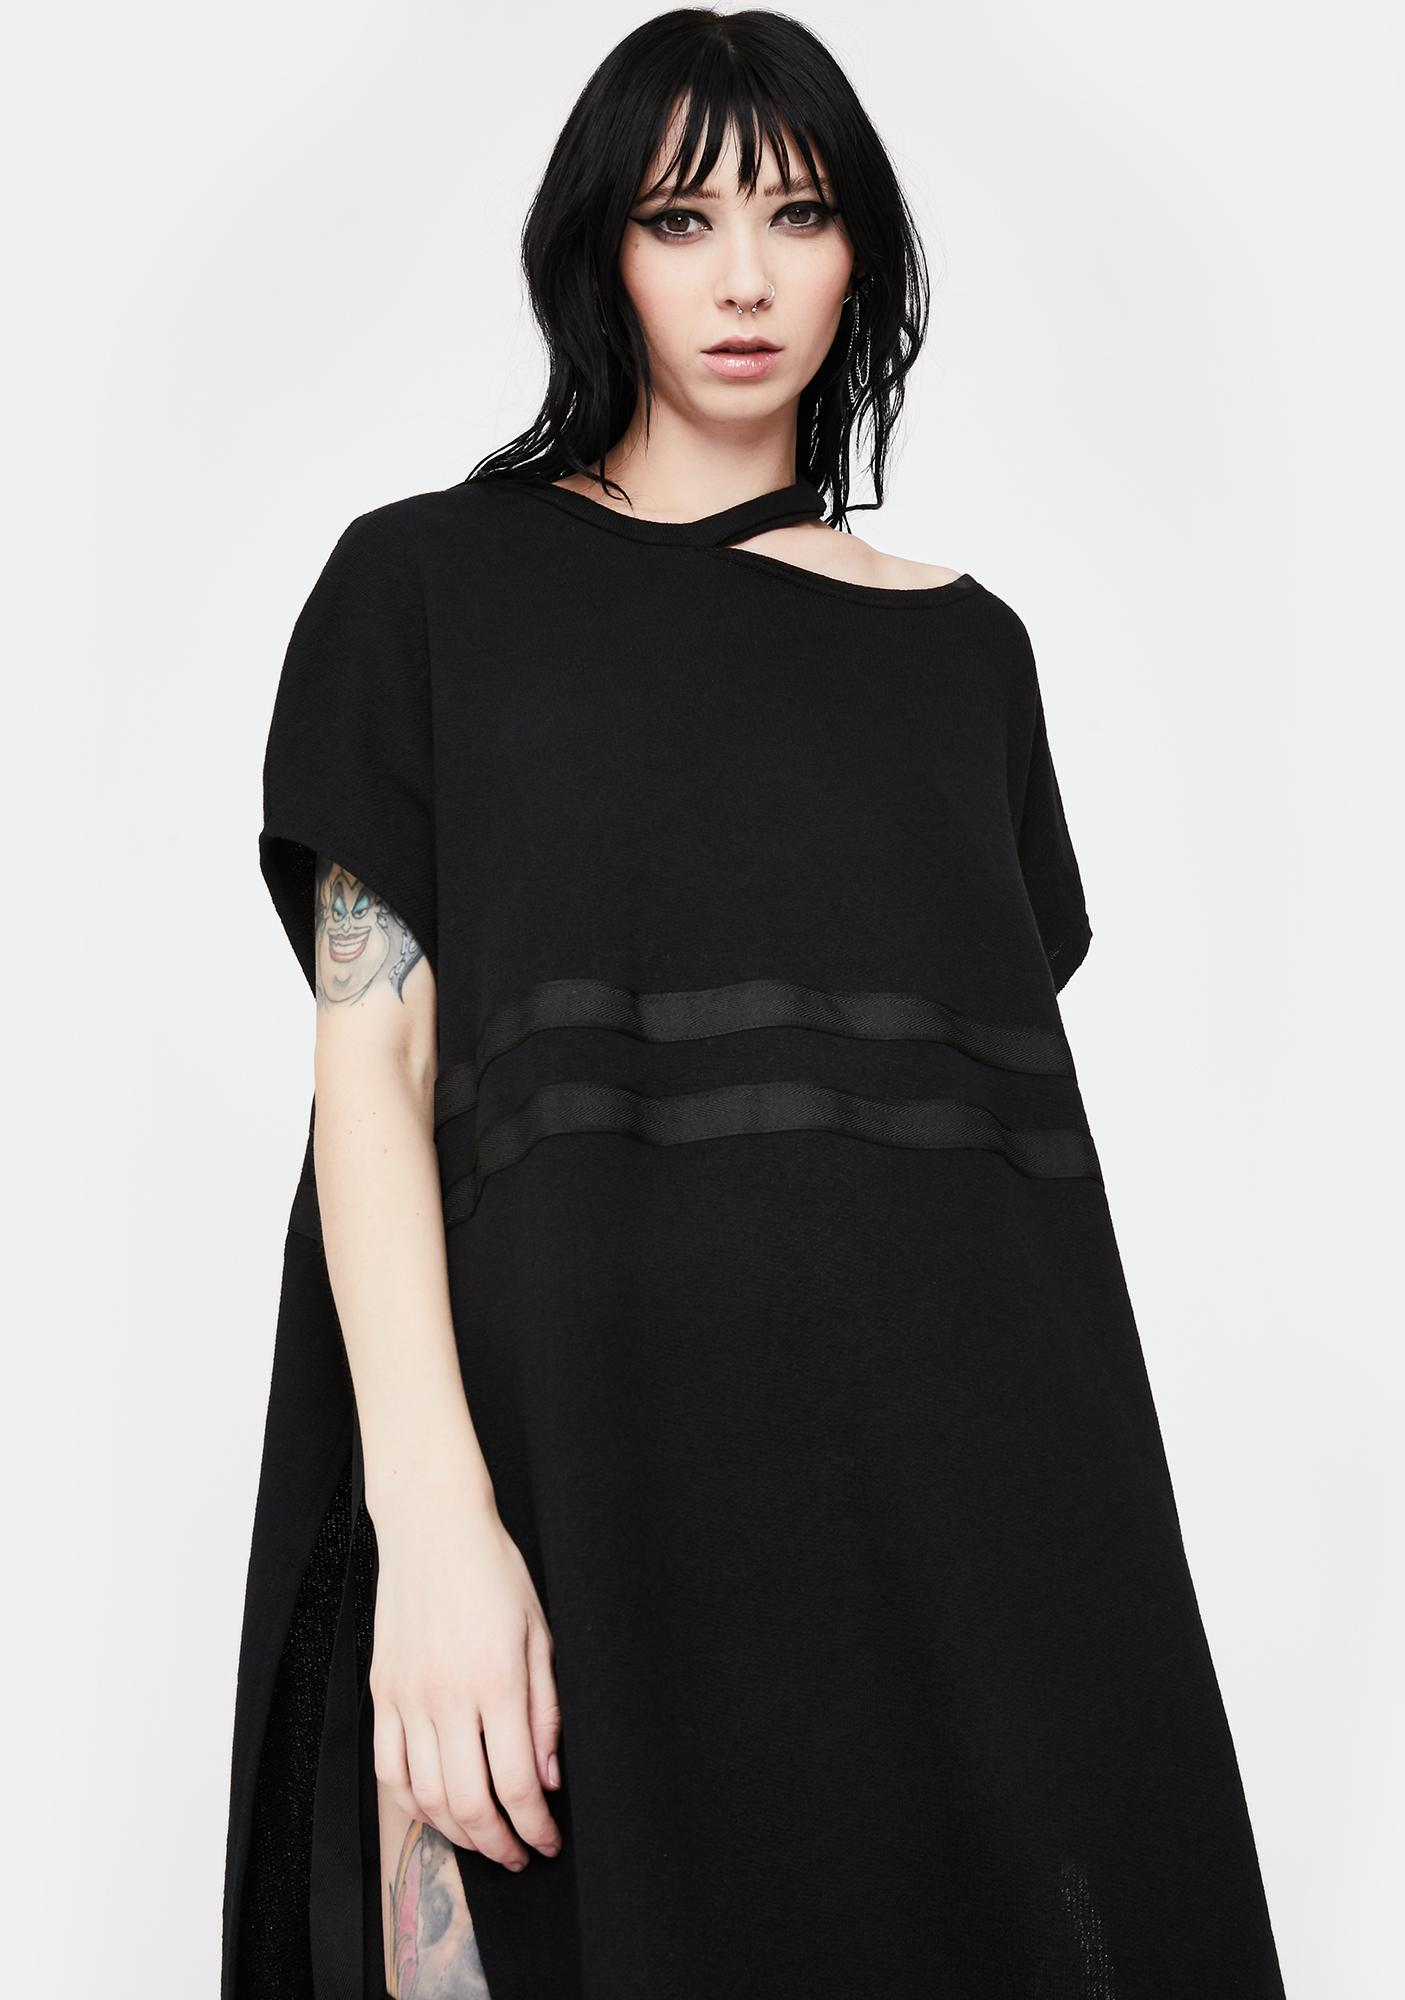 NOCTEX Nomad Knit Tunic